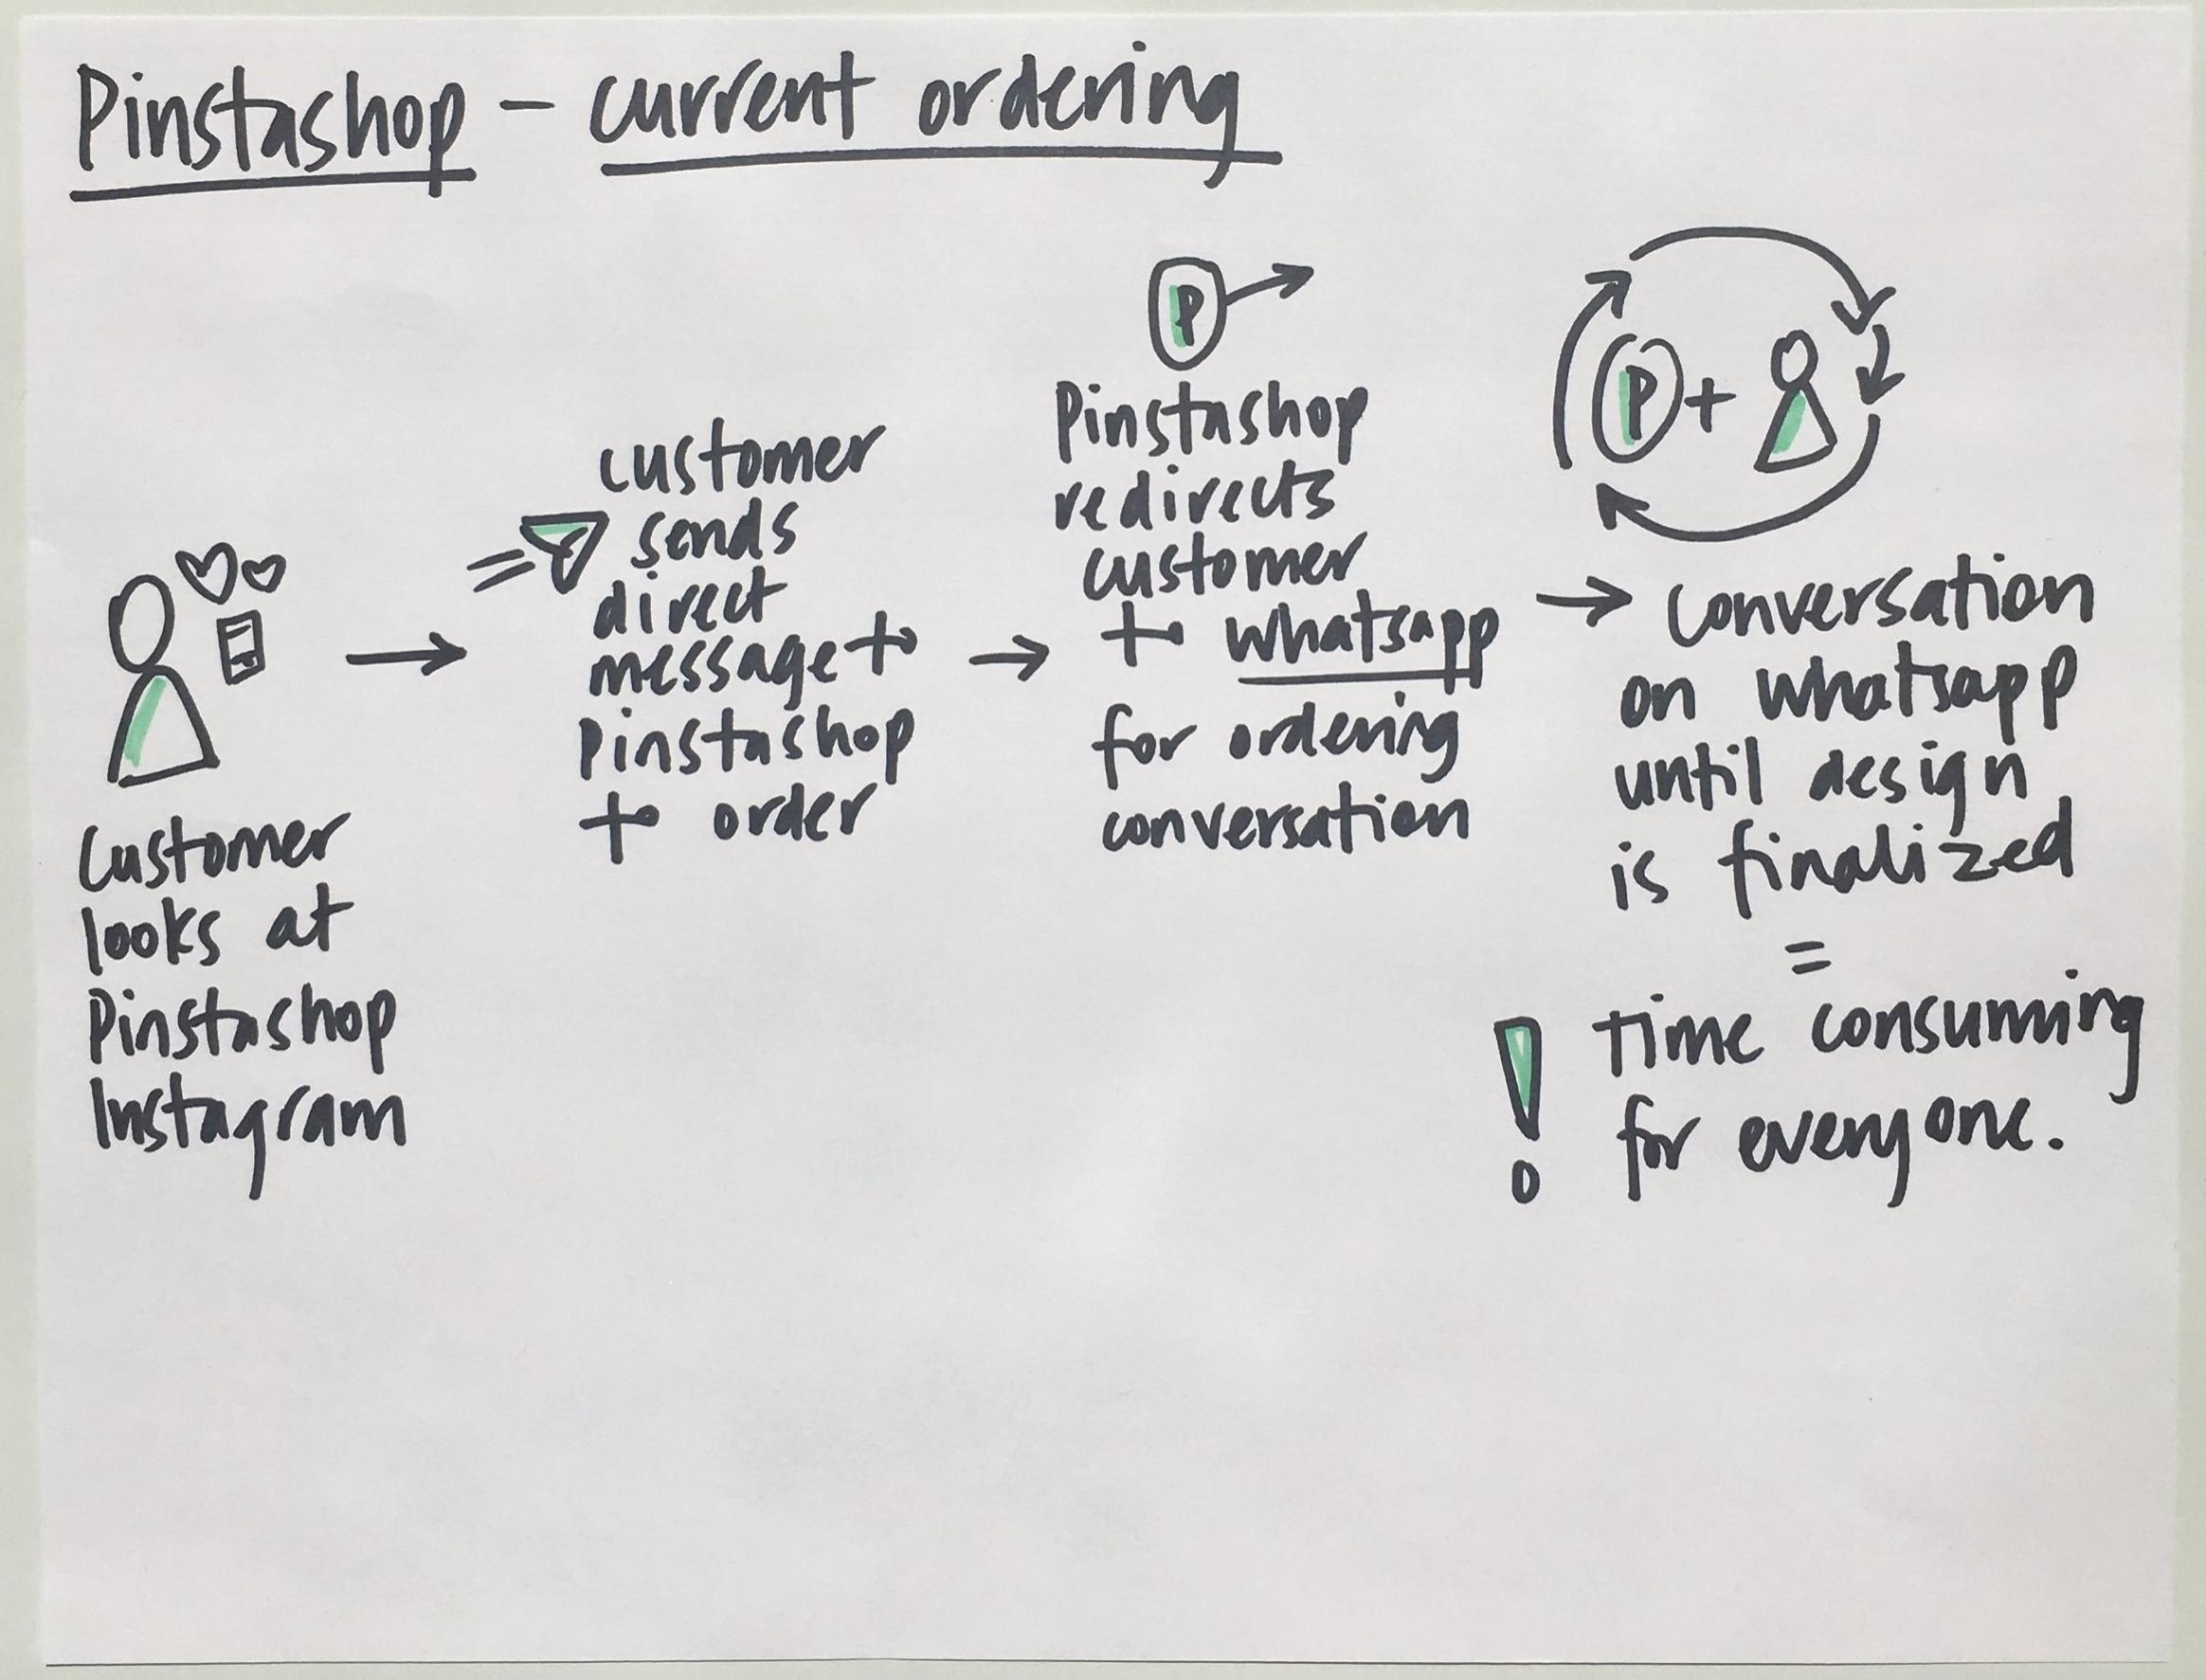 CurrentOrderingSketch.jpg